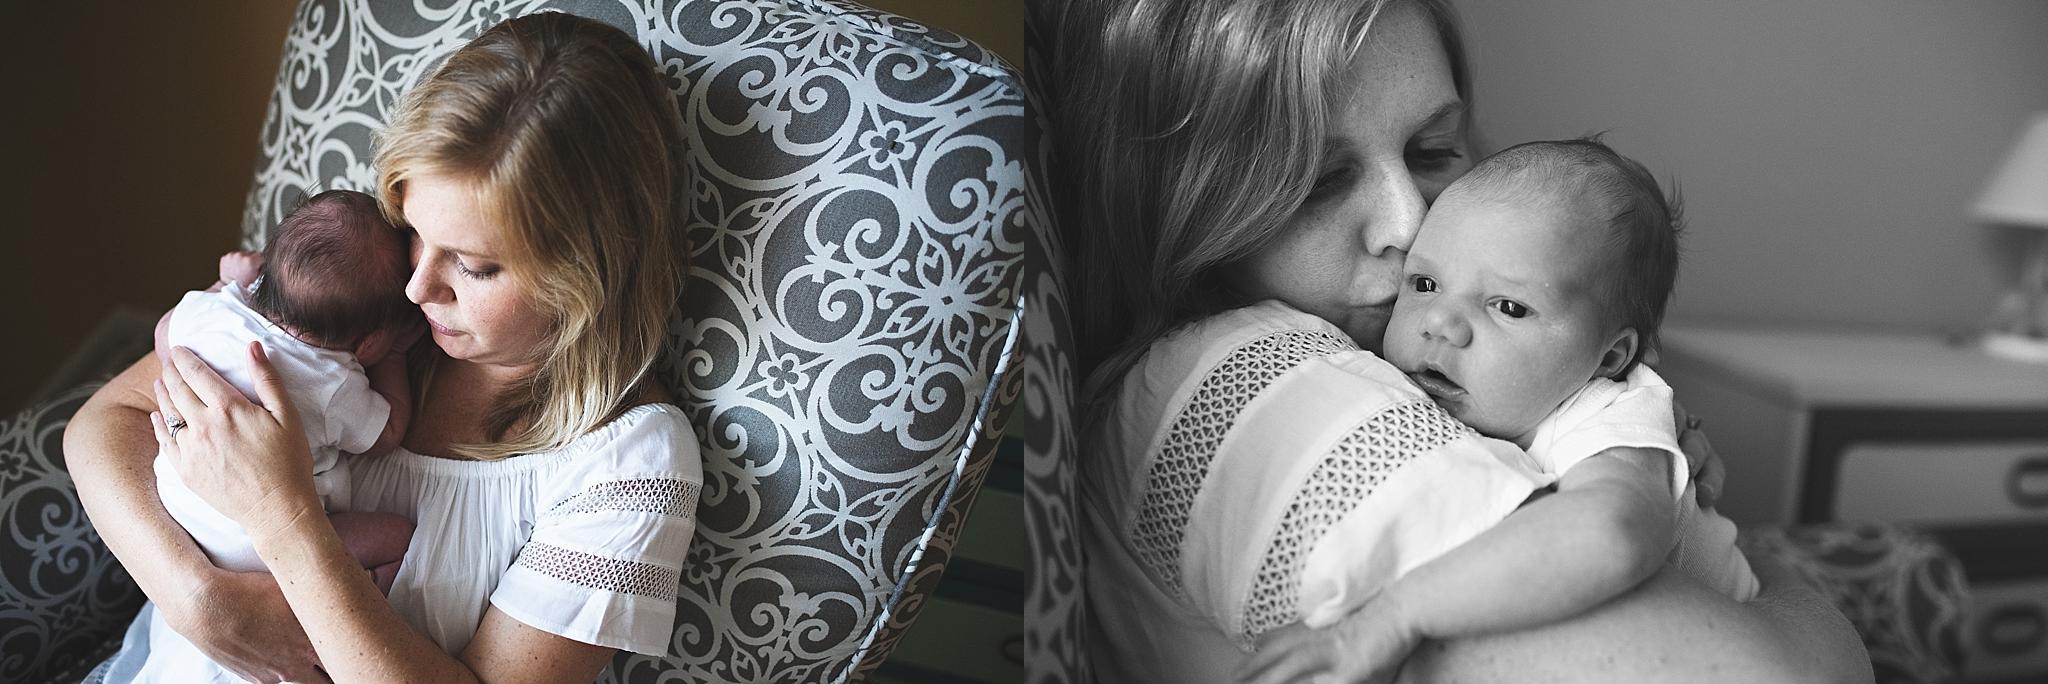 karra lynn photo lifestyle newborn at home - mom and newborn